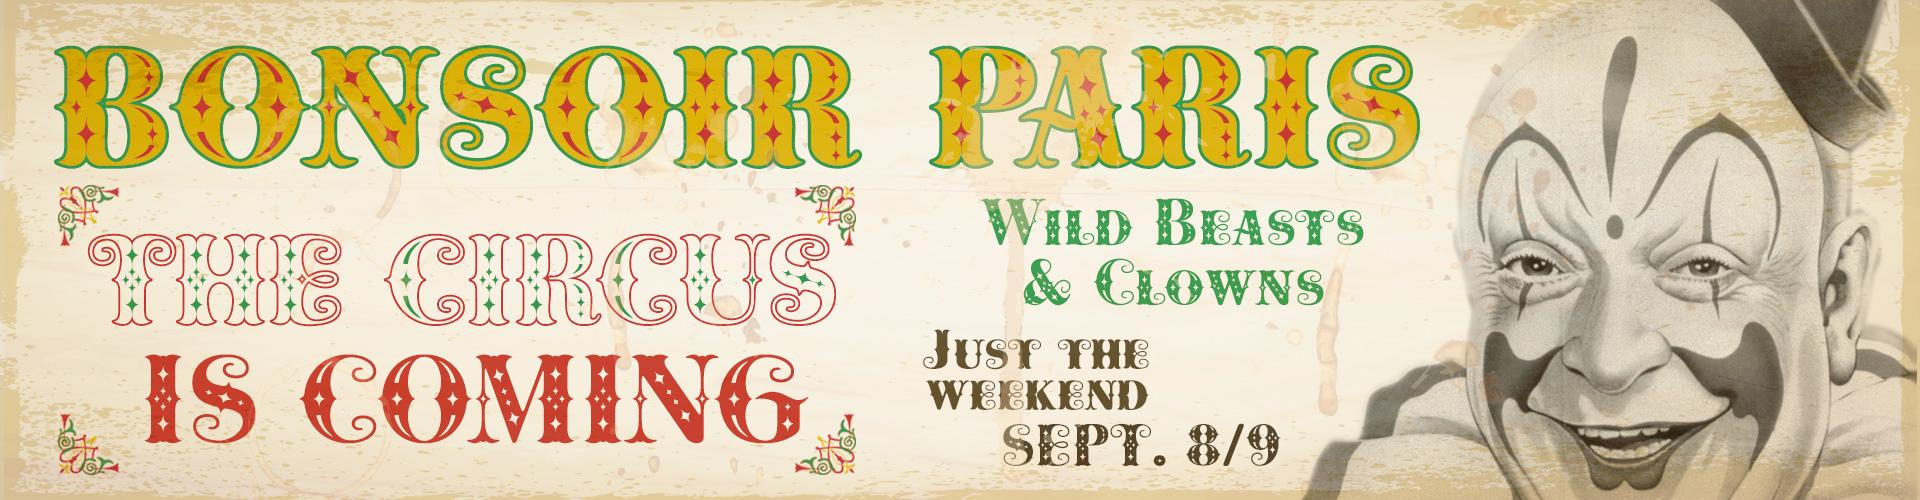 Cowboya Fonts: Bonsoir Paris, The circus is coming. Wild Beast & Clowns.